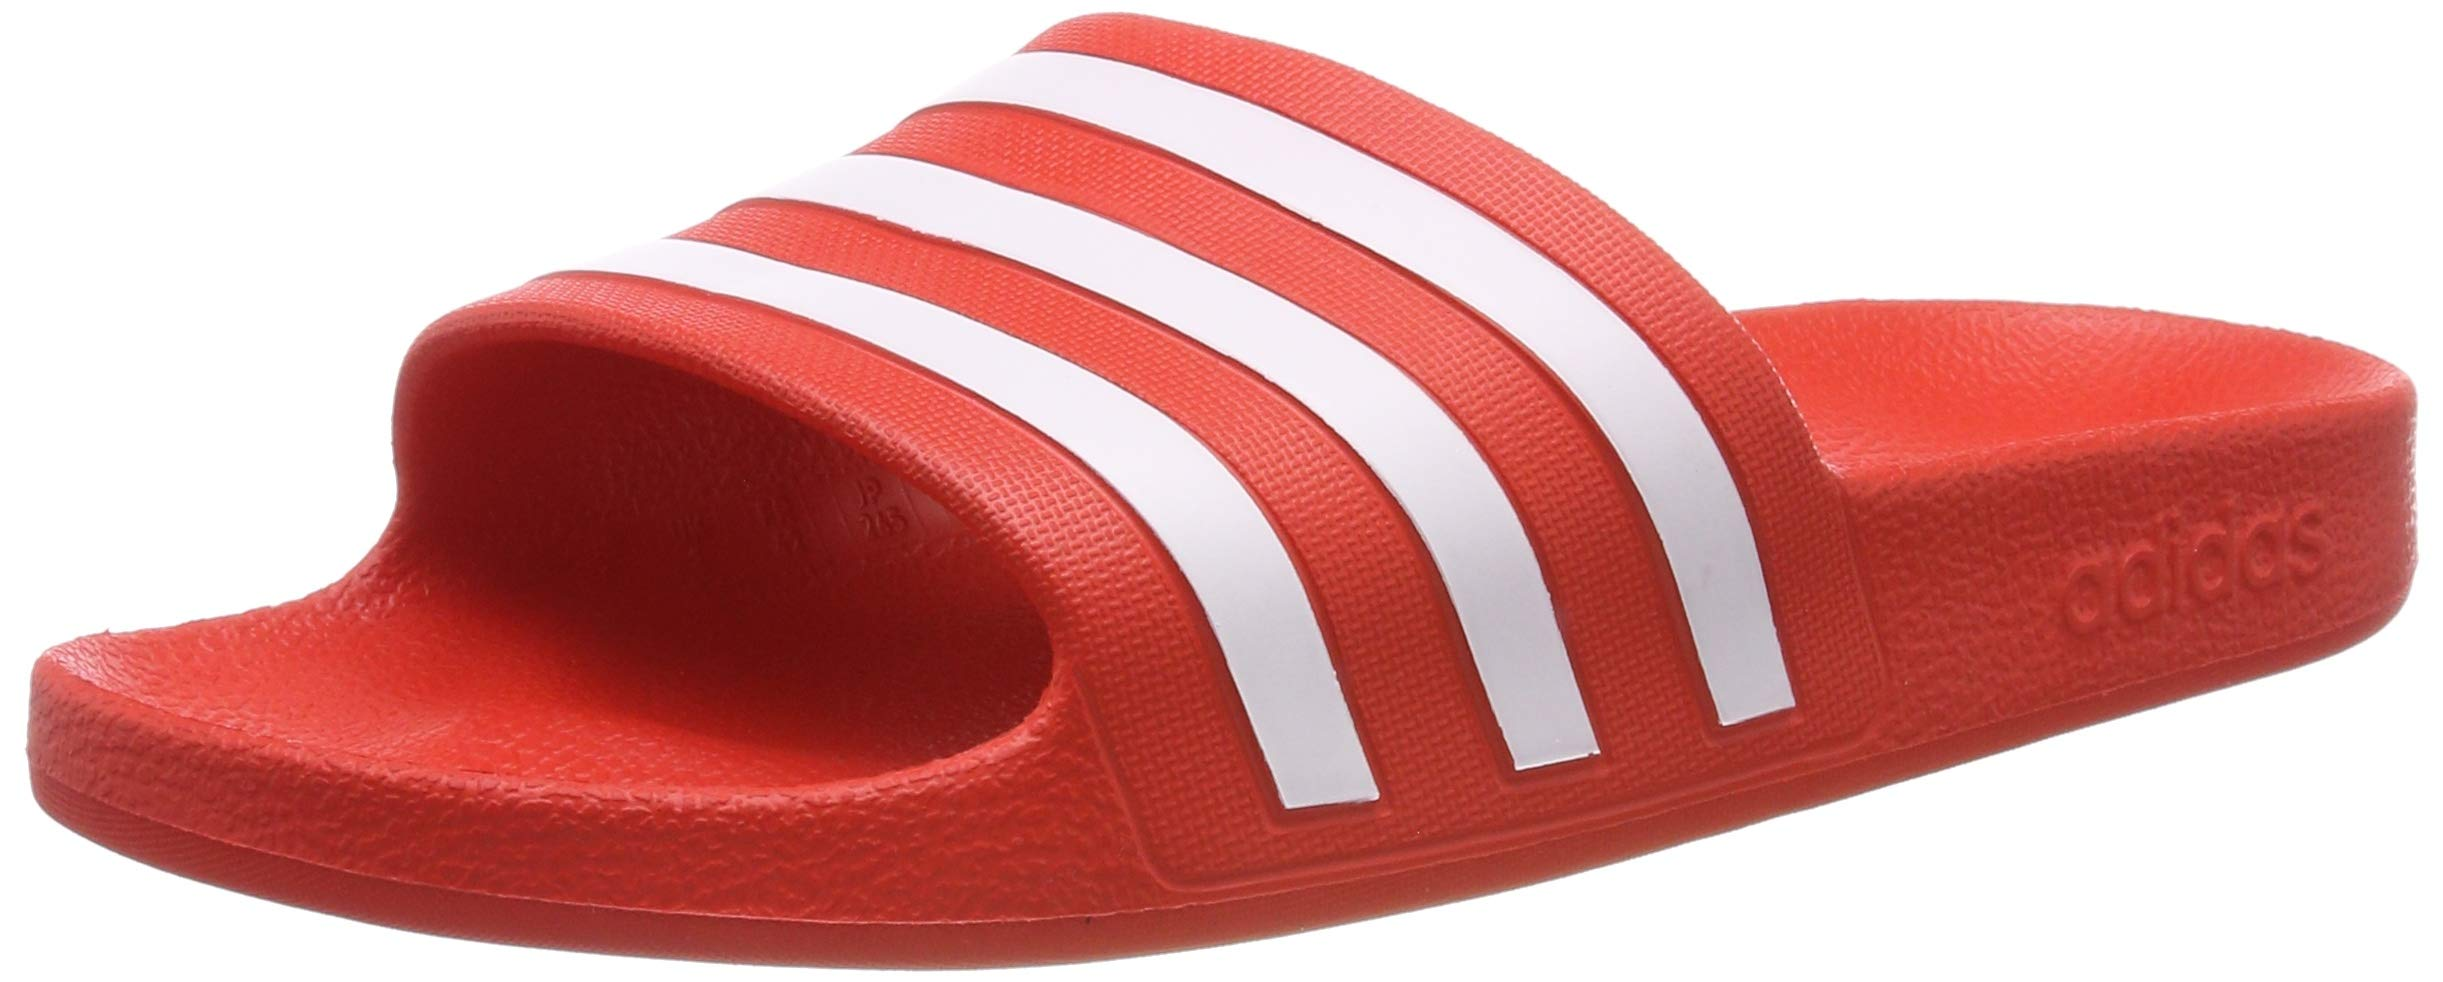 Adidas Adilette Aqua Scarpe da Spiaggia e Piscina Unisex - Adulto 1 spesavip